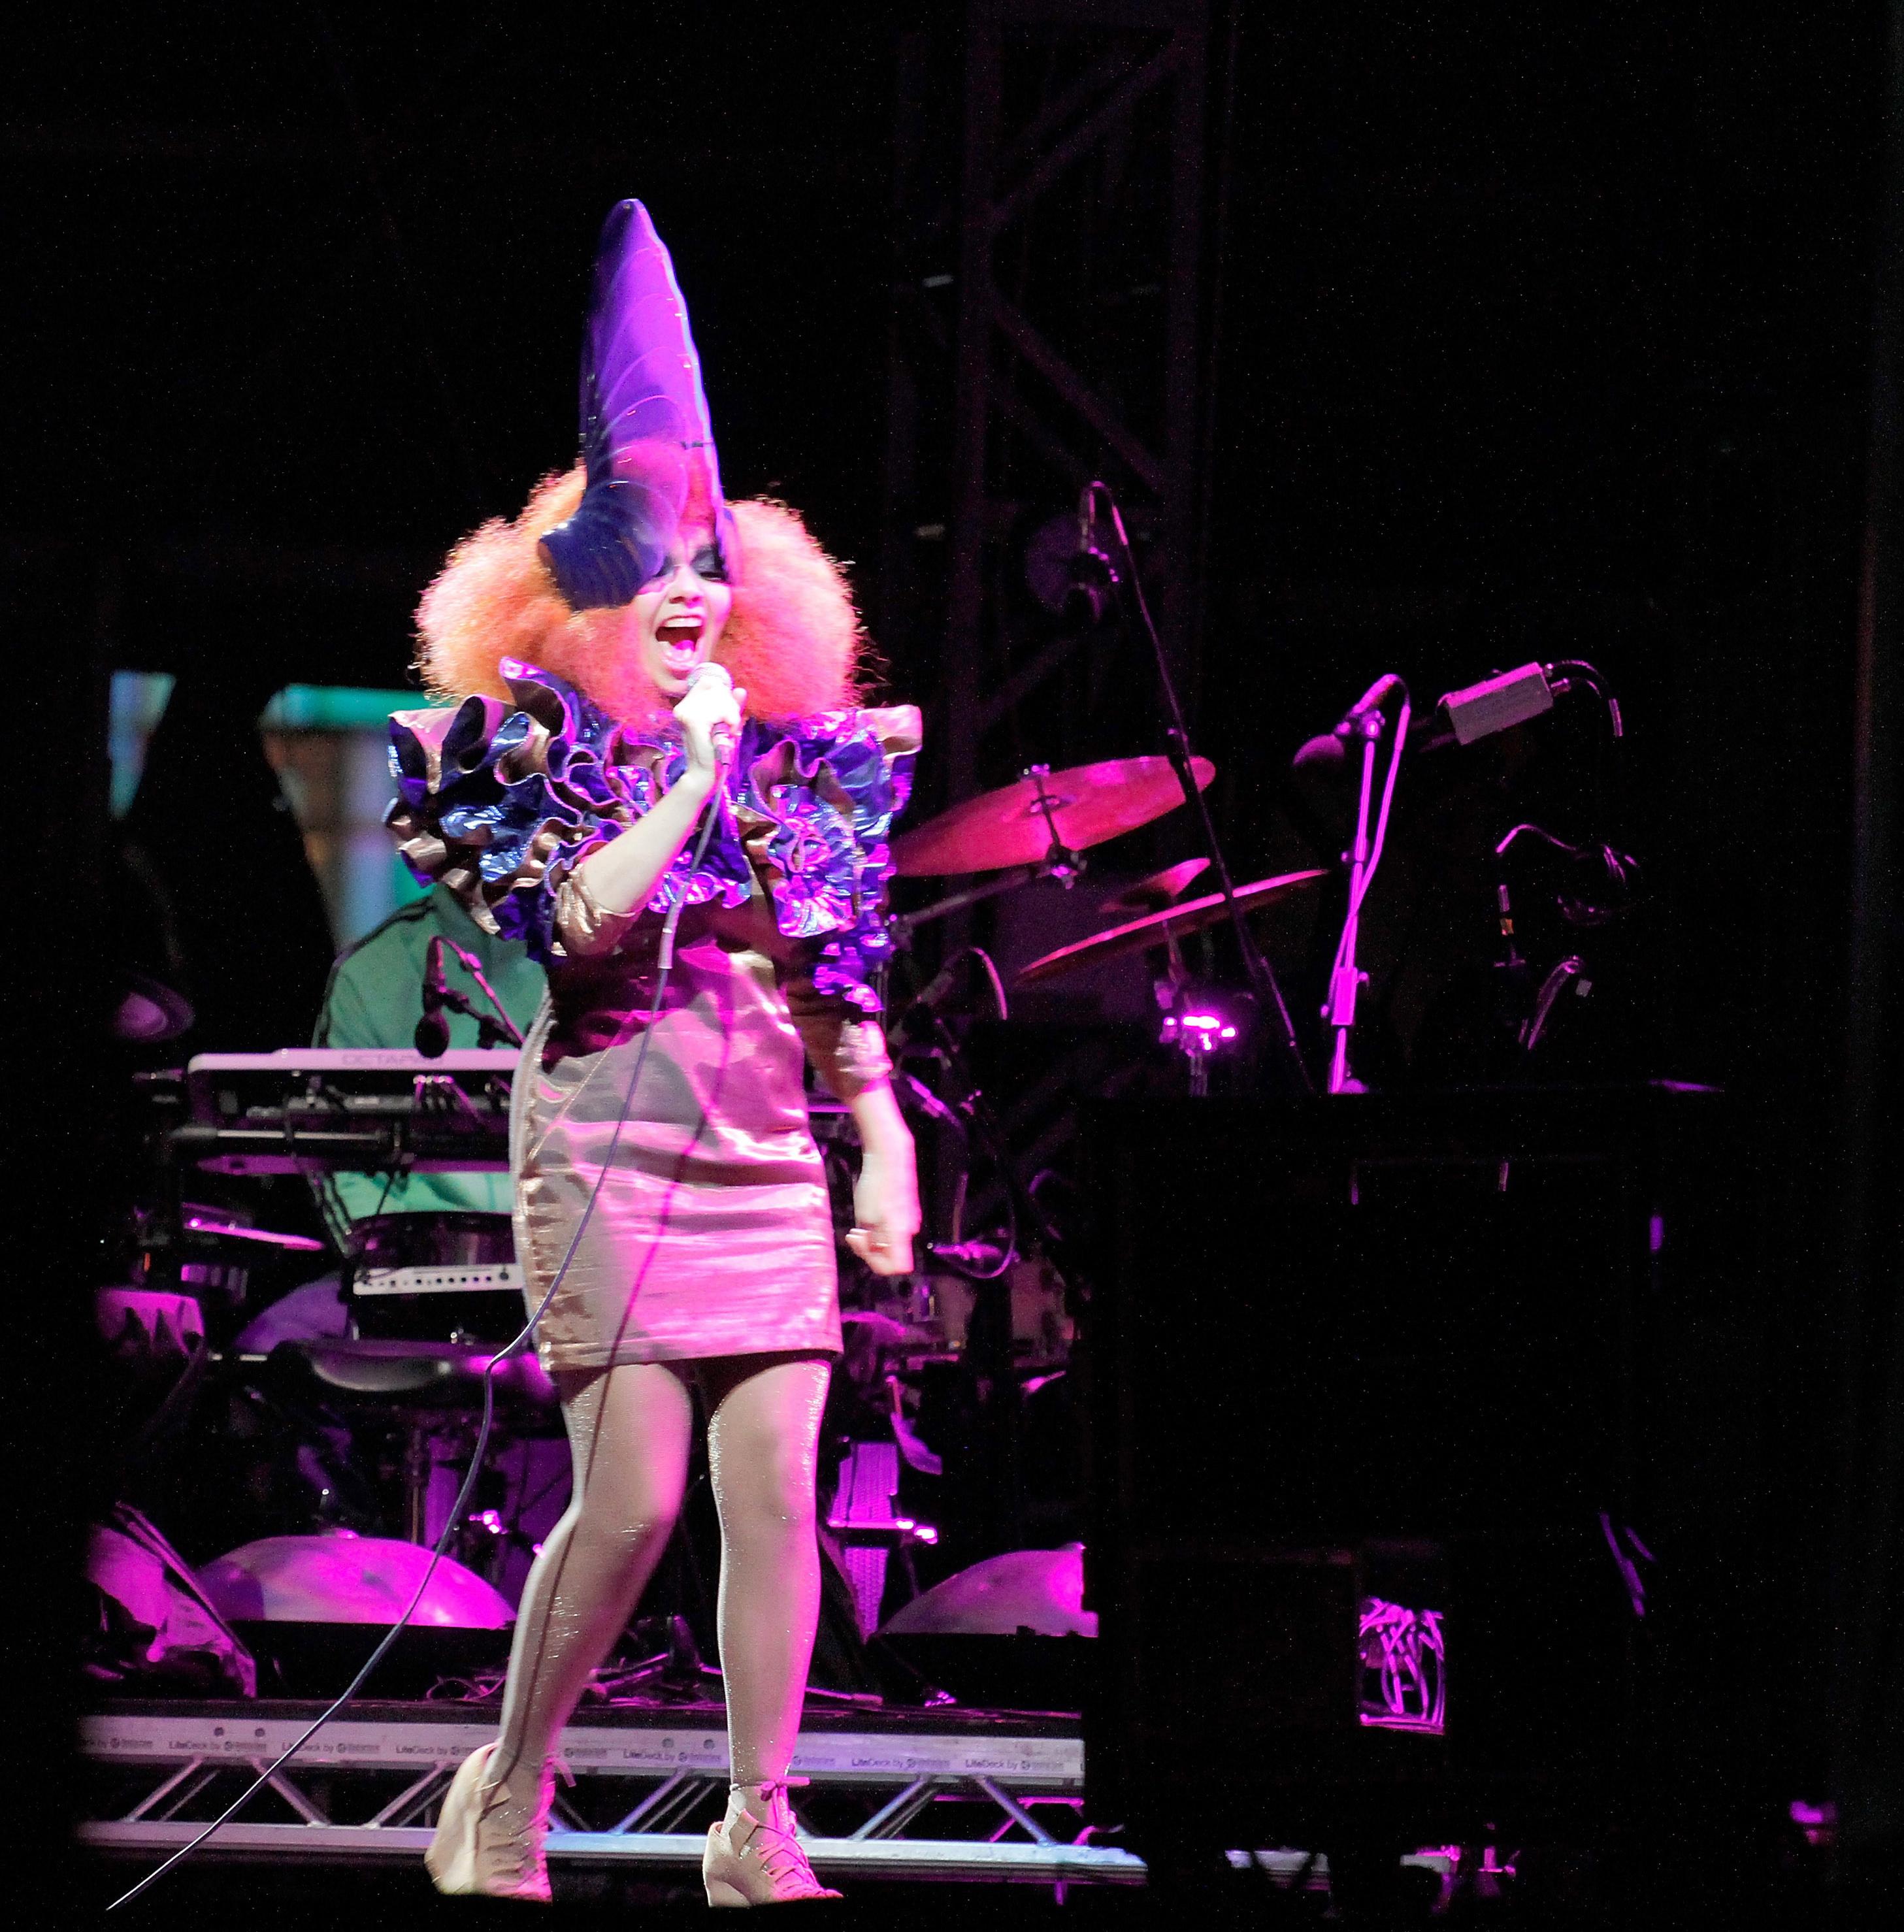 Björk performs in Newport, Isle of Wight on Sept. 11, 2011.